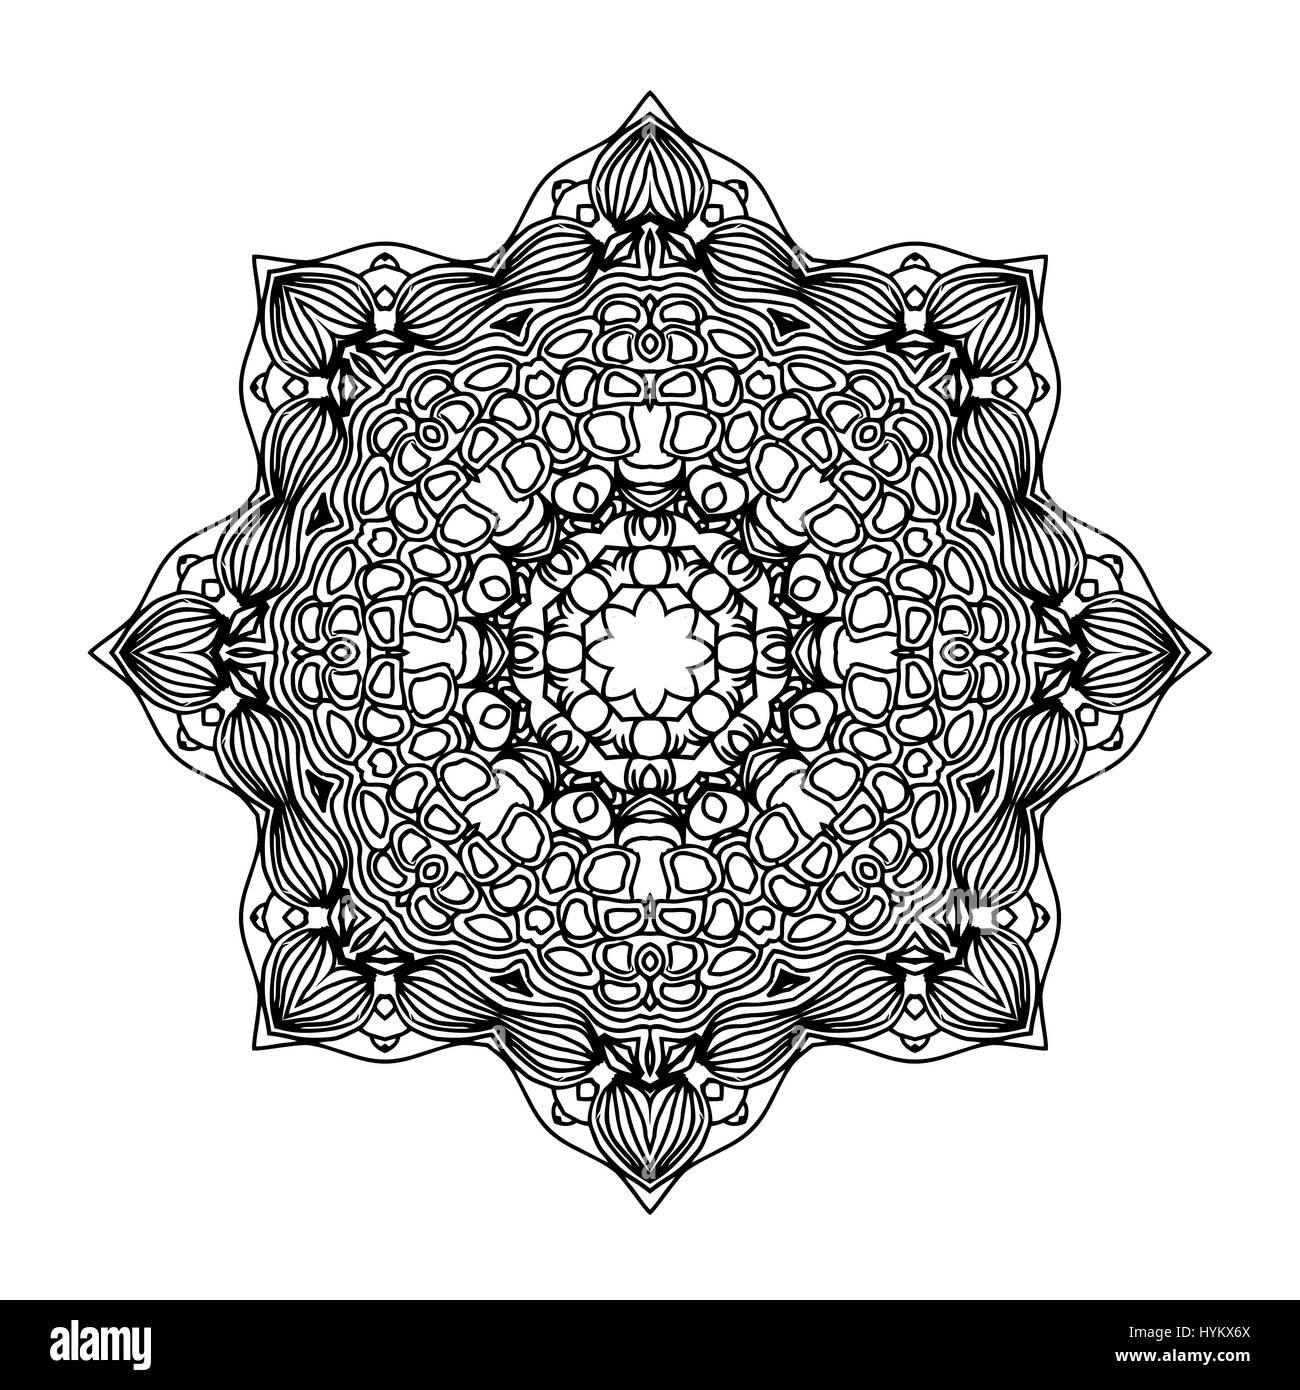 Mandala. Ethnic decorative round element. Hand drawn lacy pattern. Islam, Arabic, Indian, ottoman motifs. Boho style. - Stock Image